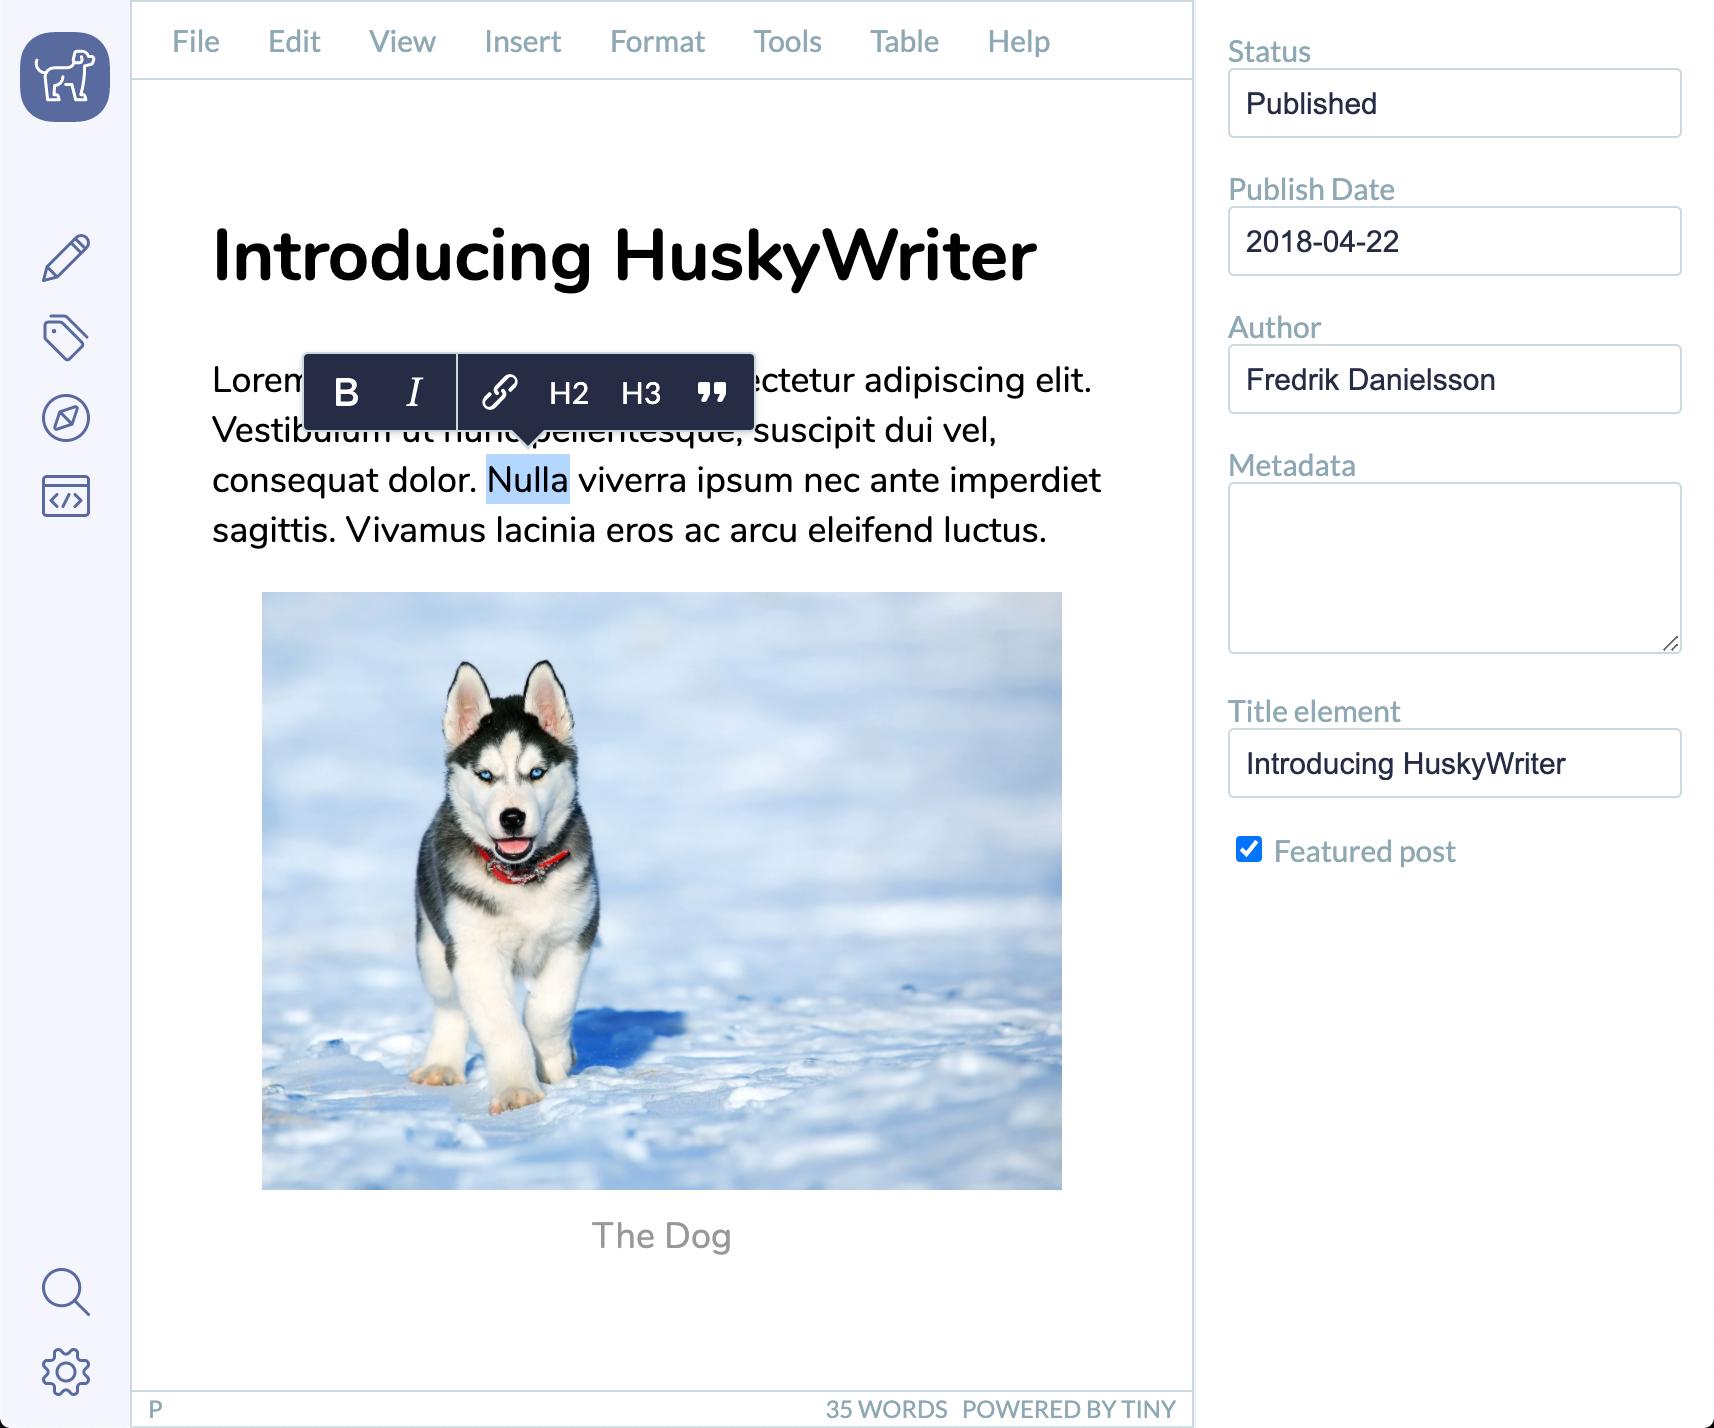 A blogging platform built with TinyMCE.